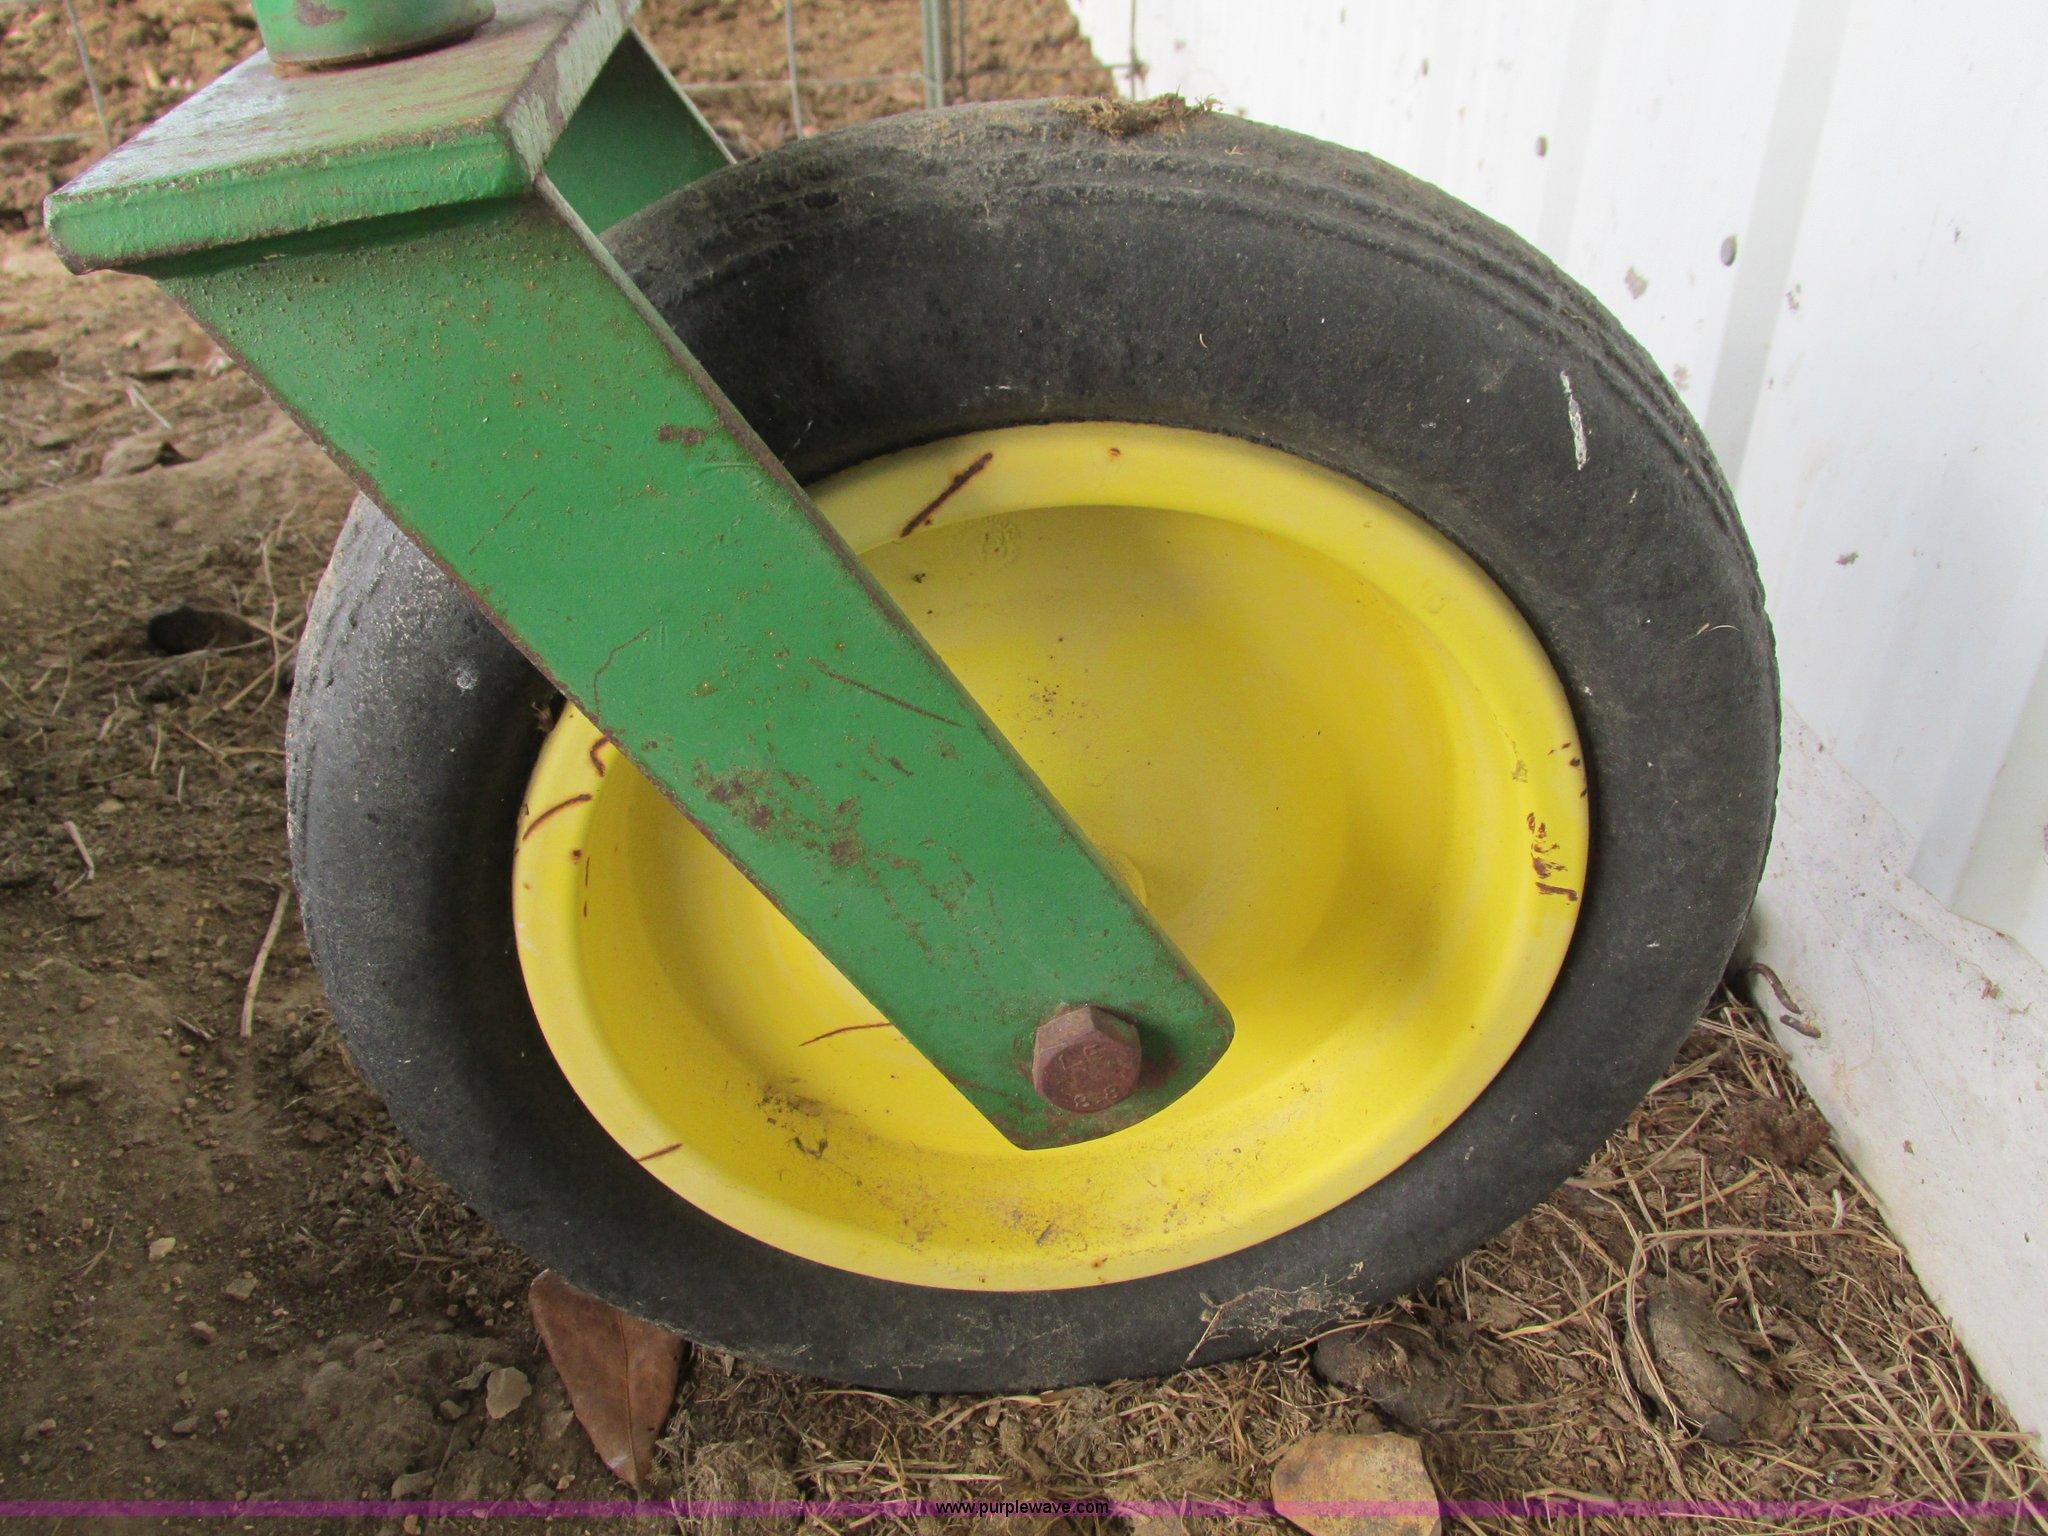 John Deere 616 rotary mower | Item AC9952 | SOLD! February 2